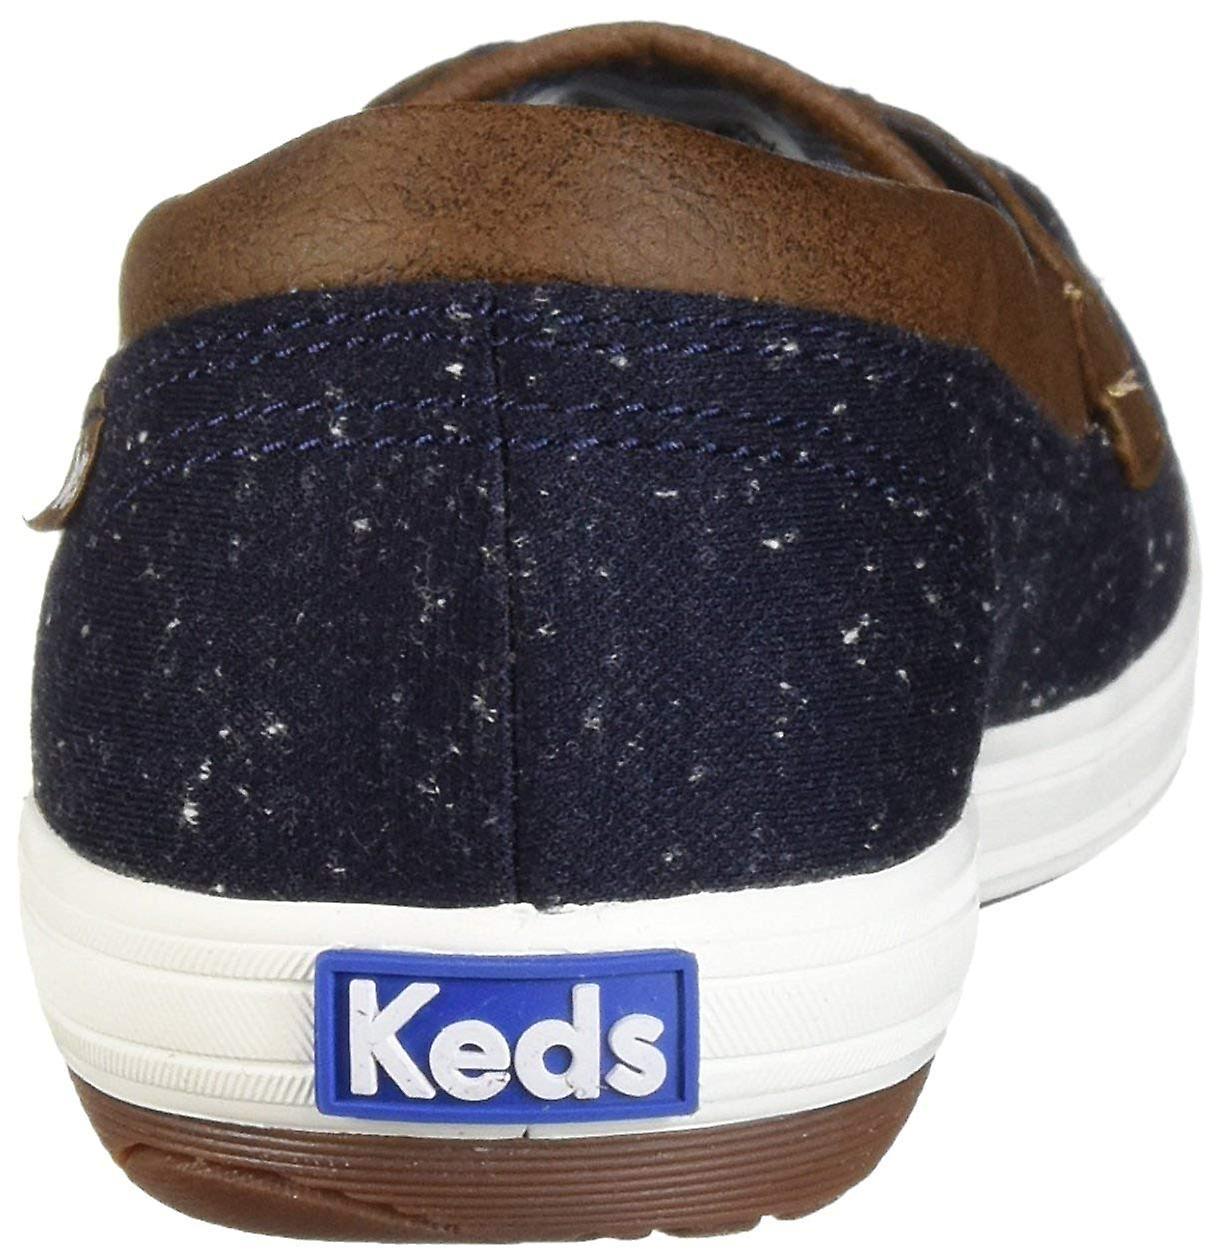 Keds Women's Glimmer Speckled Knit Sneaker fRrpV